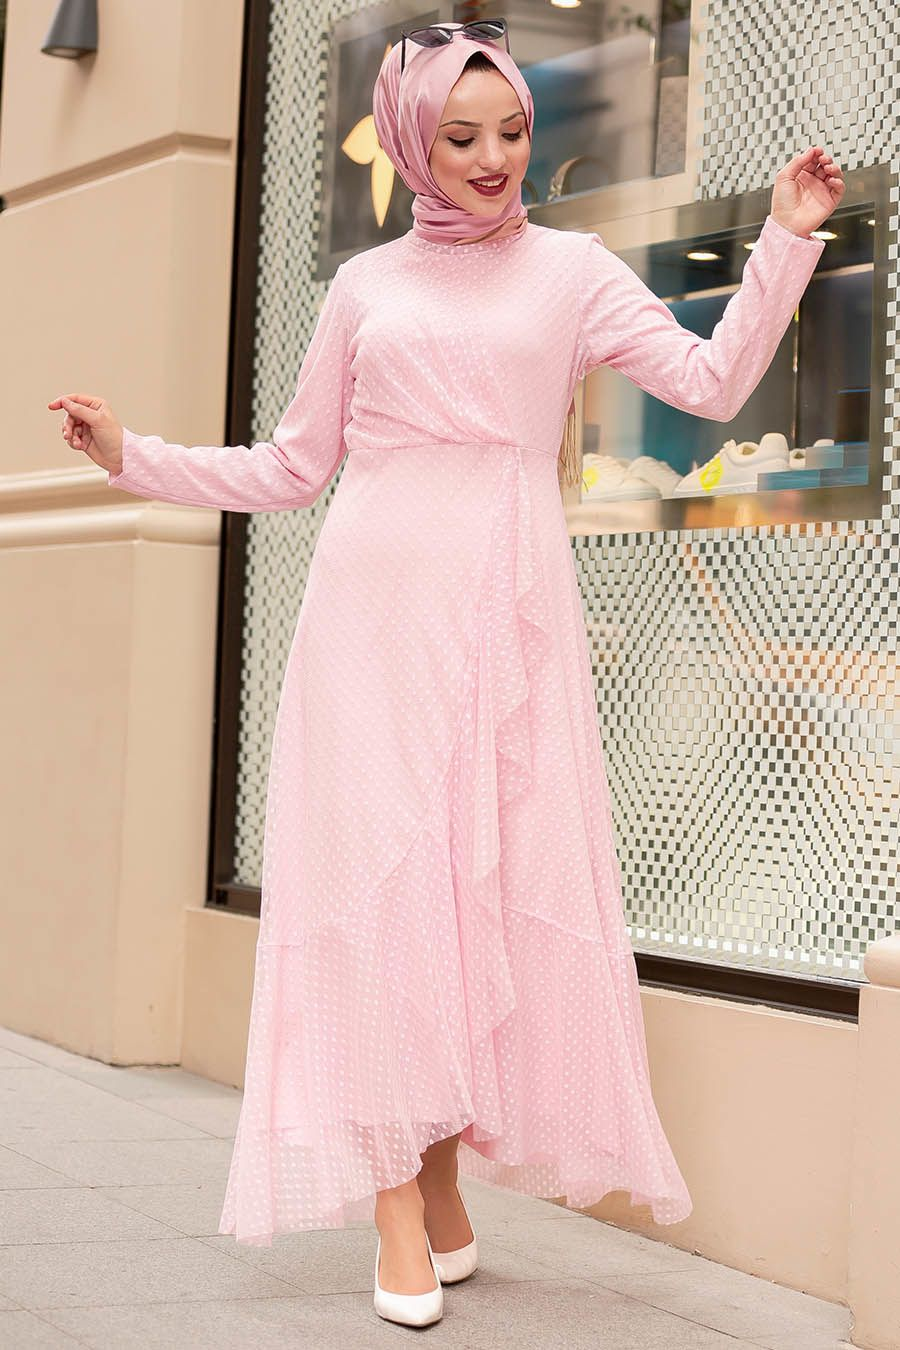 Nayla Collection Puantiyeli Pembe Tesettur Elbise 50141p Tesetturisland Com The Dress Giyim Ve Mankenler